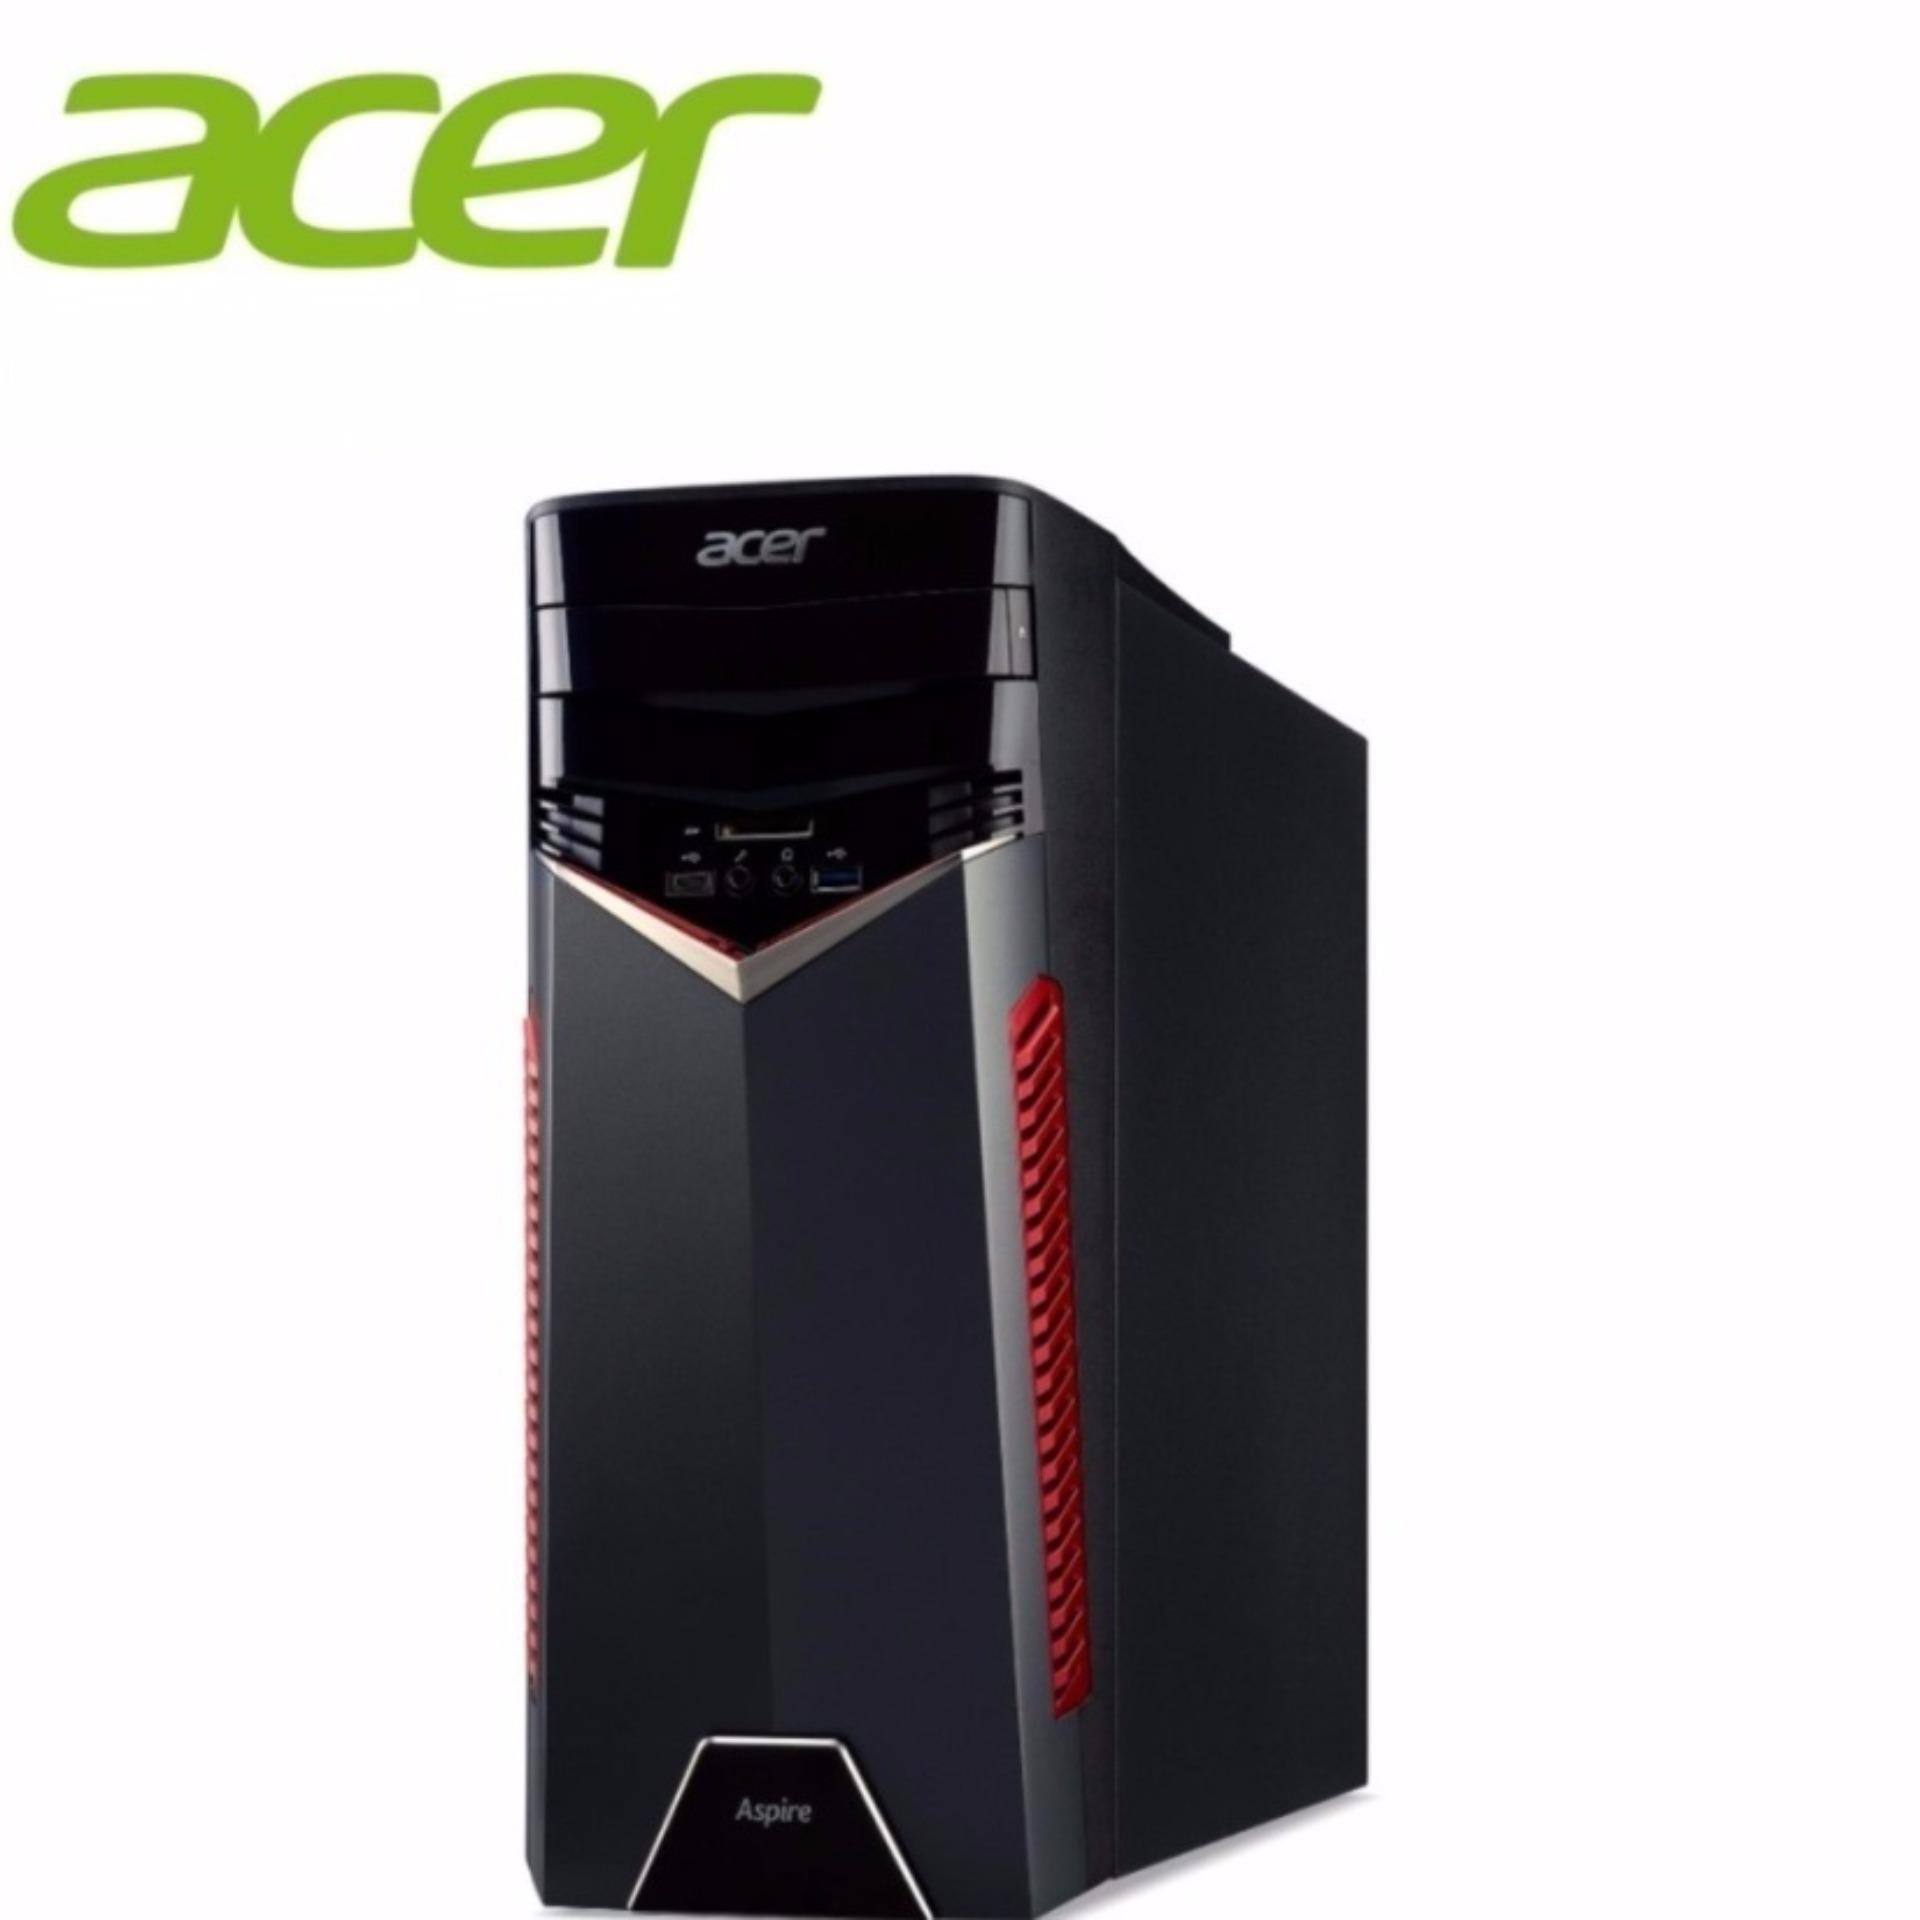 Acer Aspire GX-785 (i77MR161T06) I7-7700 16GB RAM Gaming Desktop (Black)